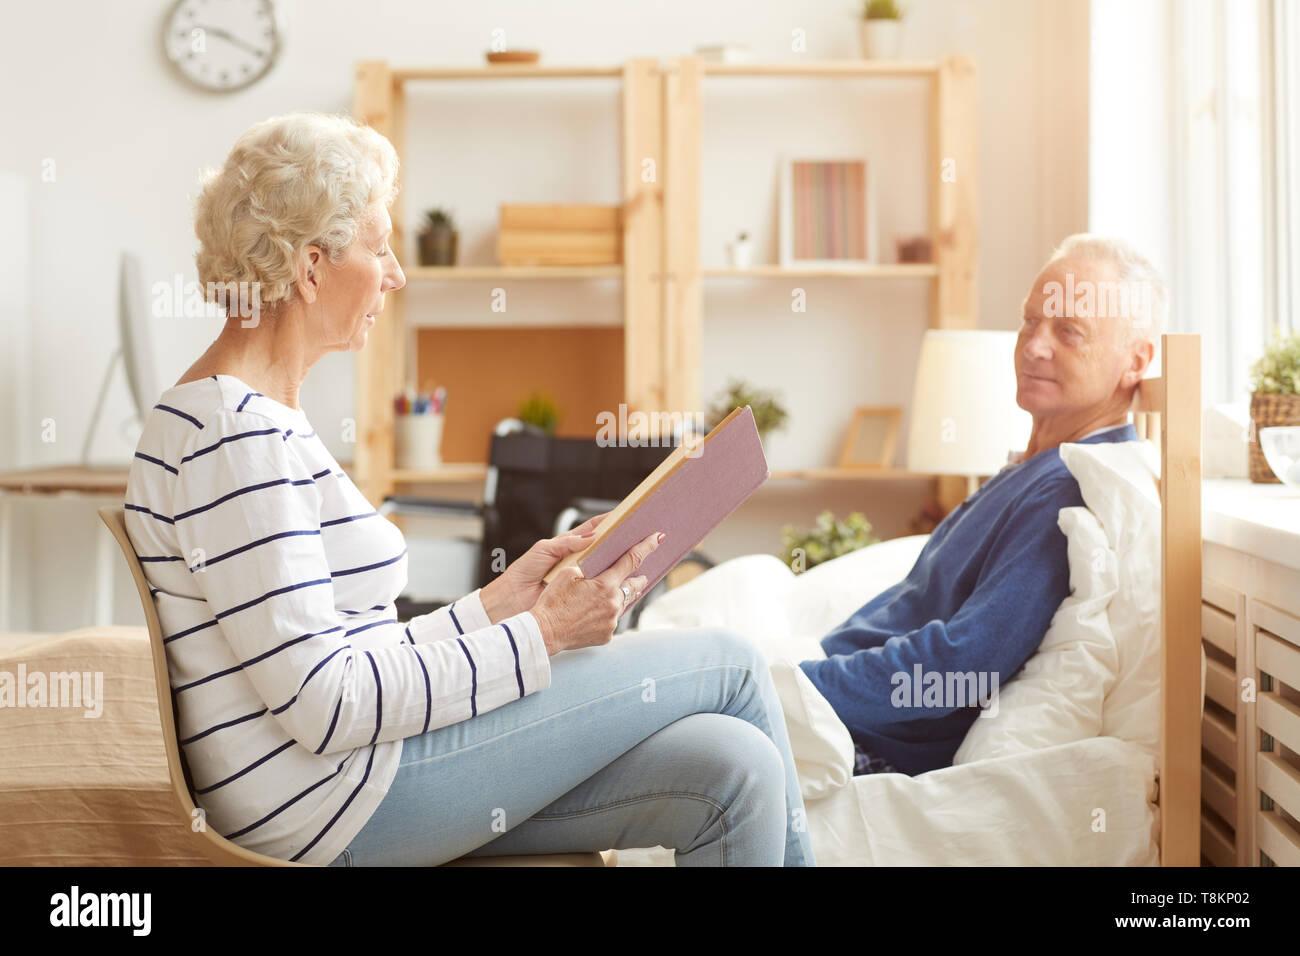 Senior Couple in Retirement - Stock Image